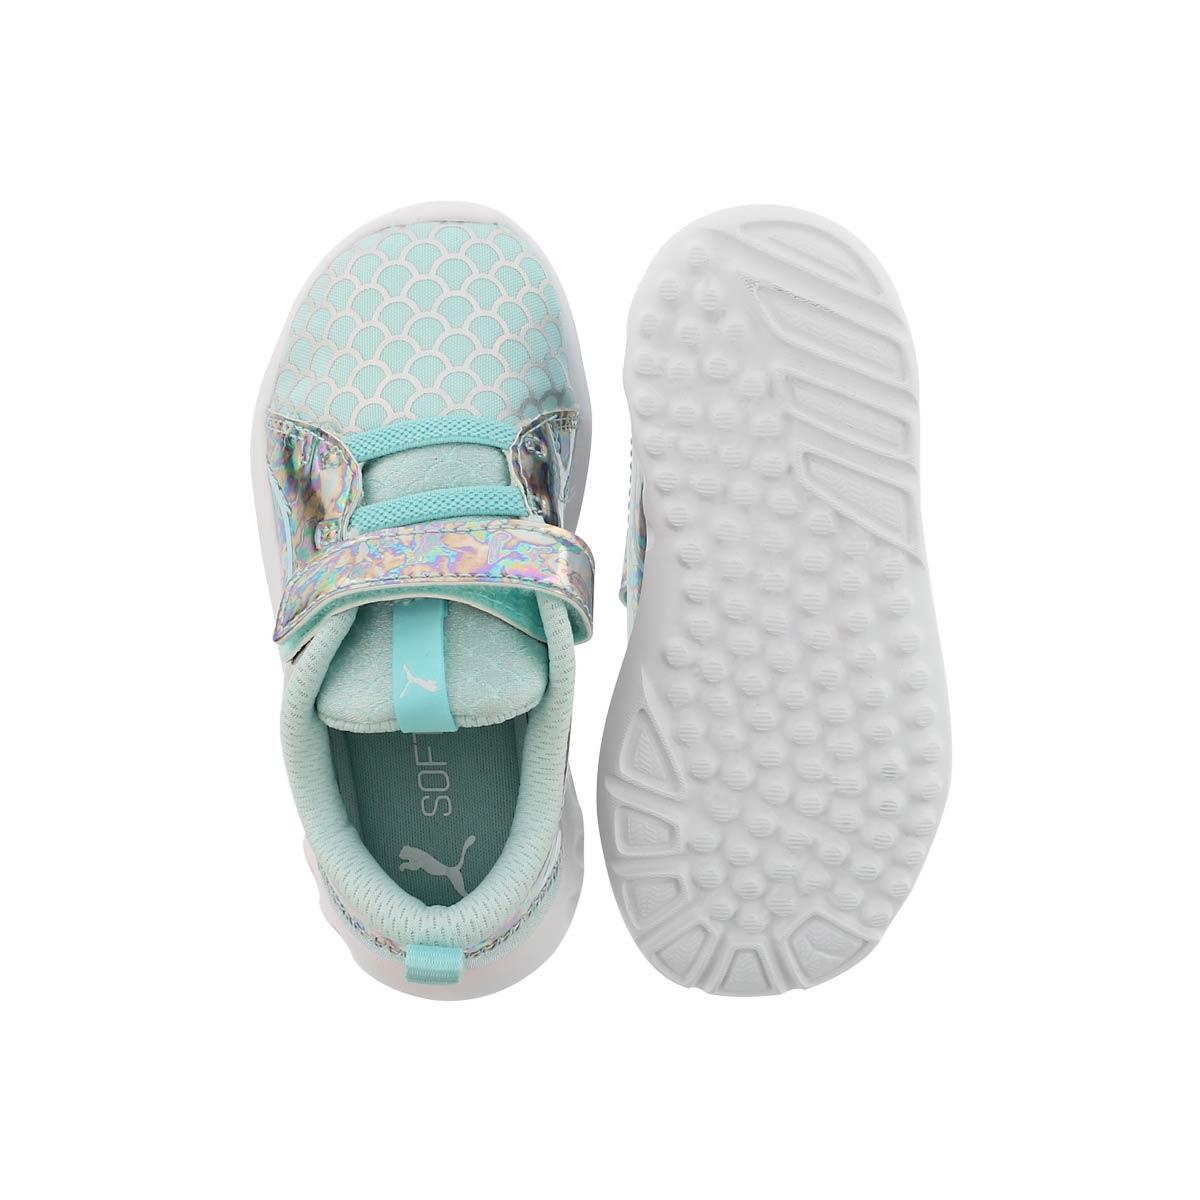 Inf-g Carson 2 Mermaid blu/slvr sneaker